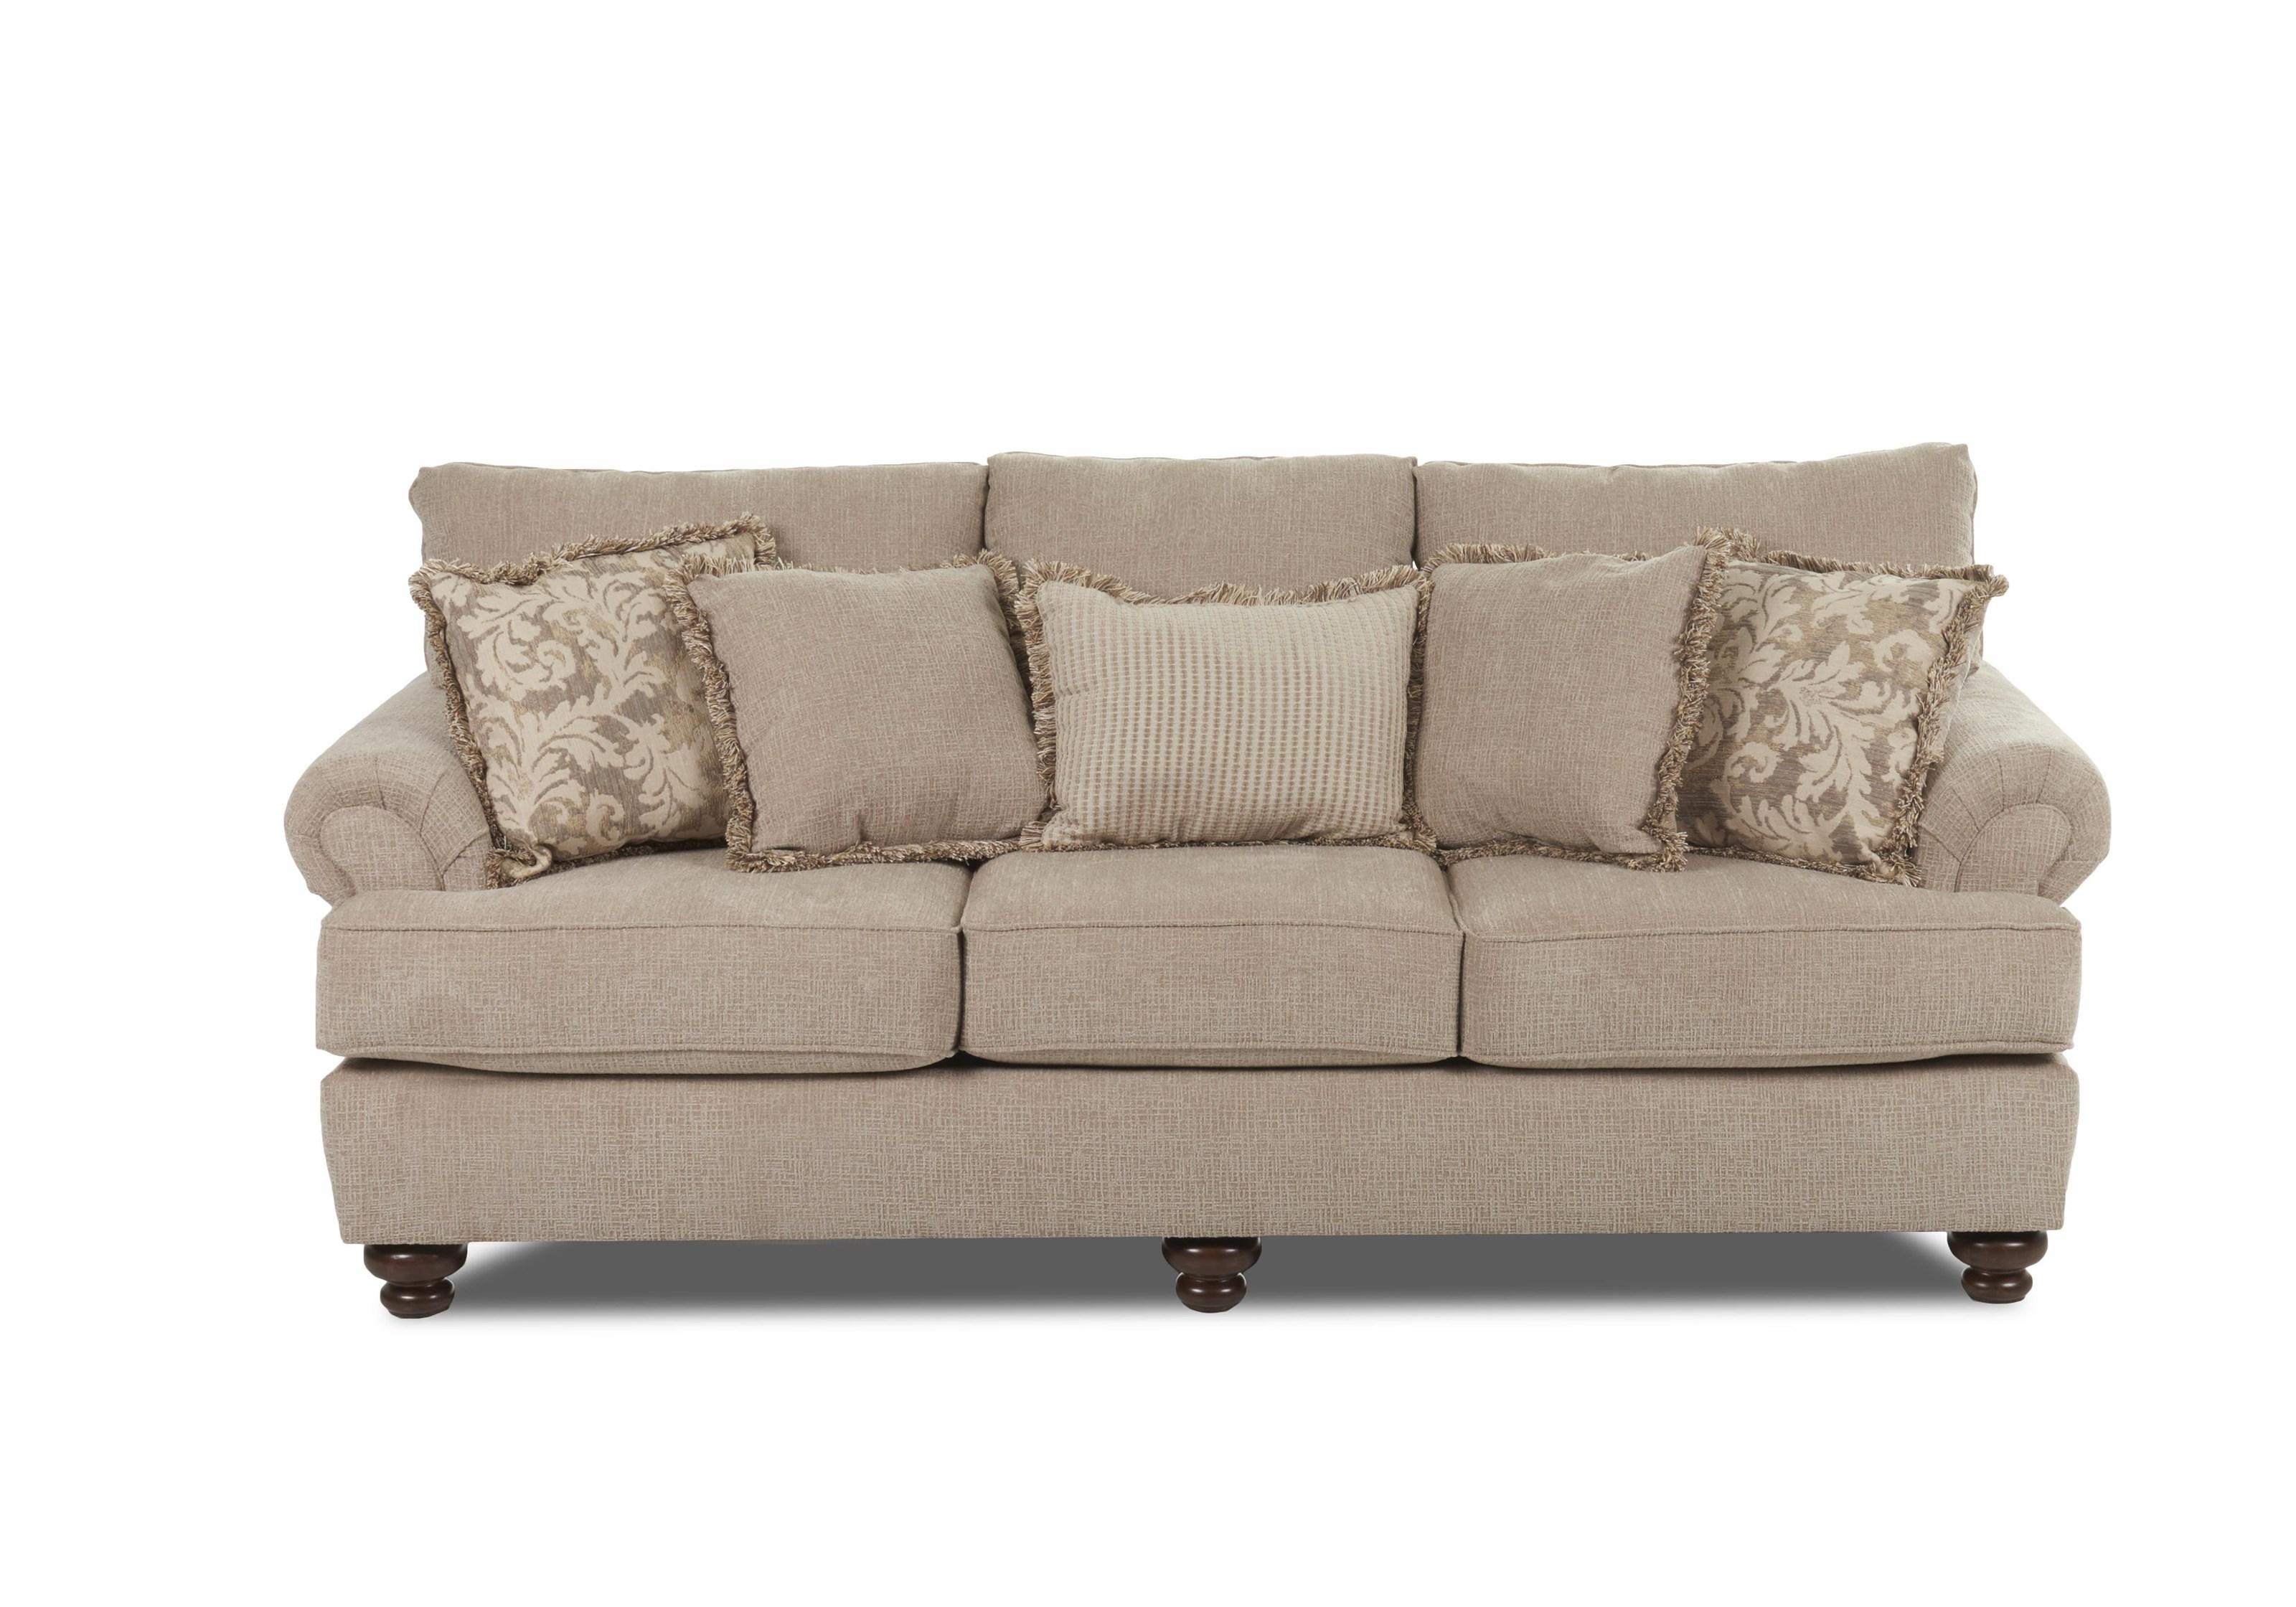 Klaussner GreenvaleTraditional Stationary Sofa ...